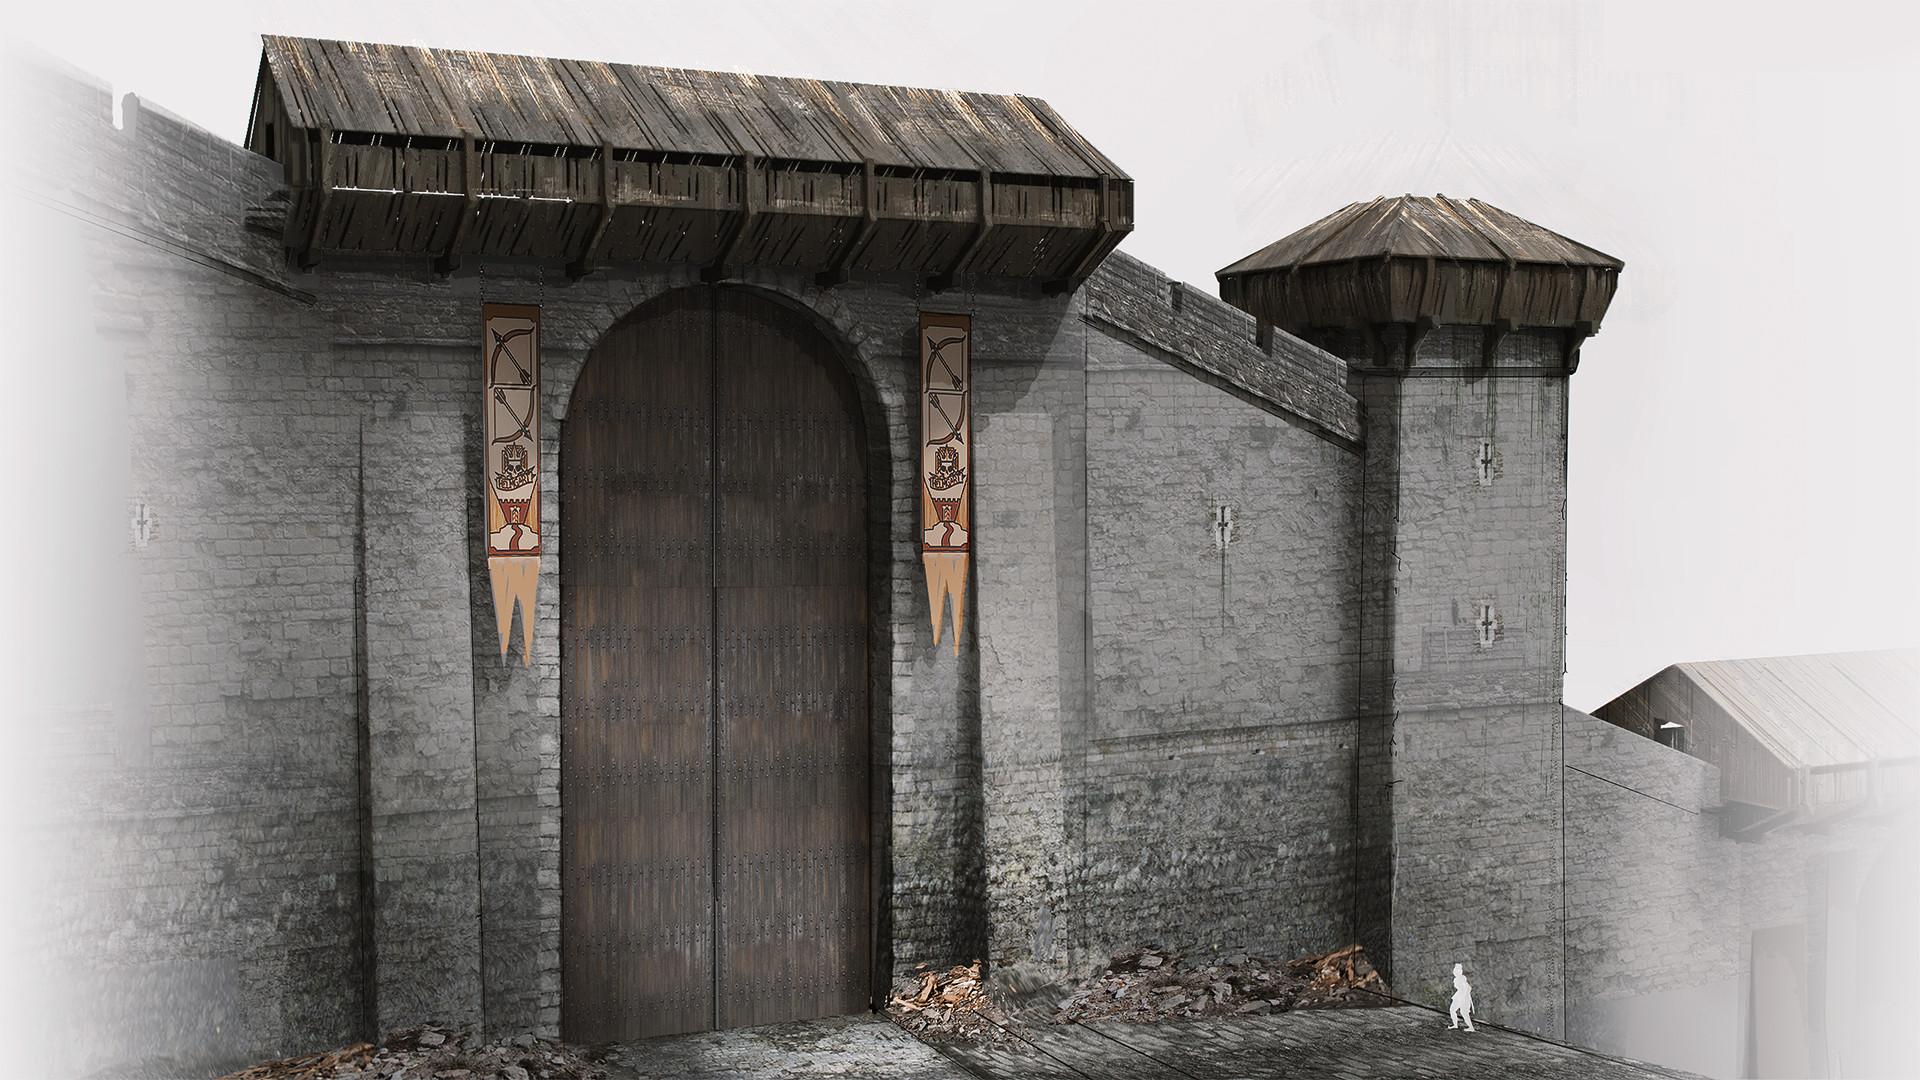 Patrik rosander righteous stand helmgart wall